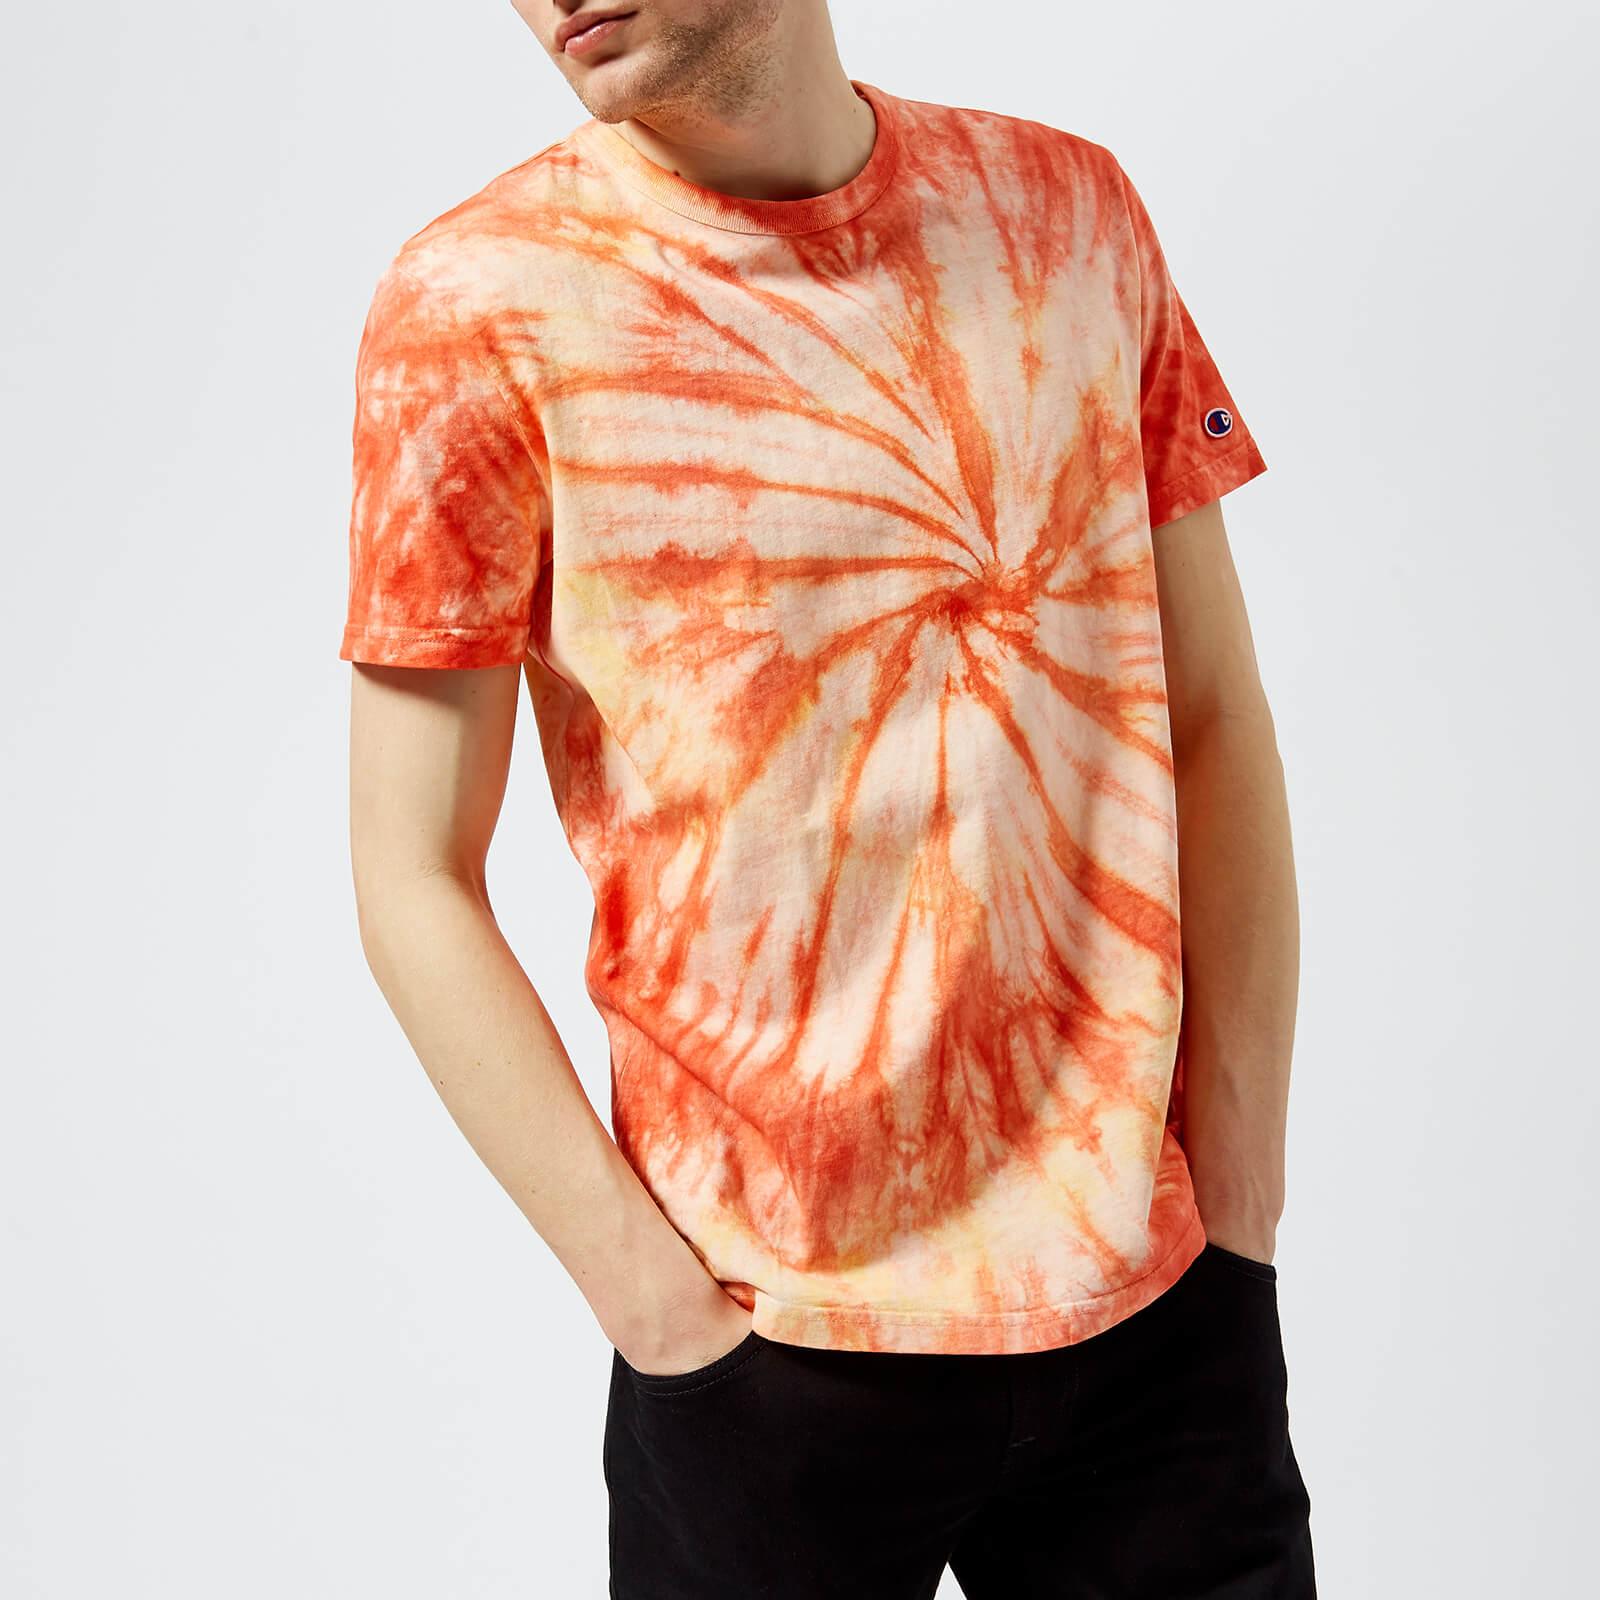 44ad6b90f0be Champion Men's 68 Weave Crew Tie Dye T-Shirt - Coral Clothing | TheHut.com